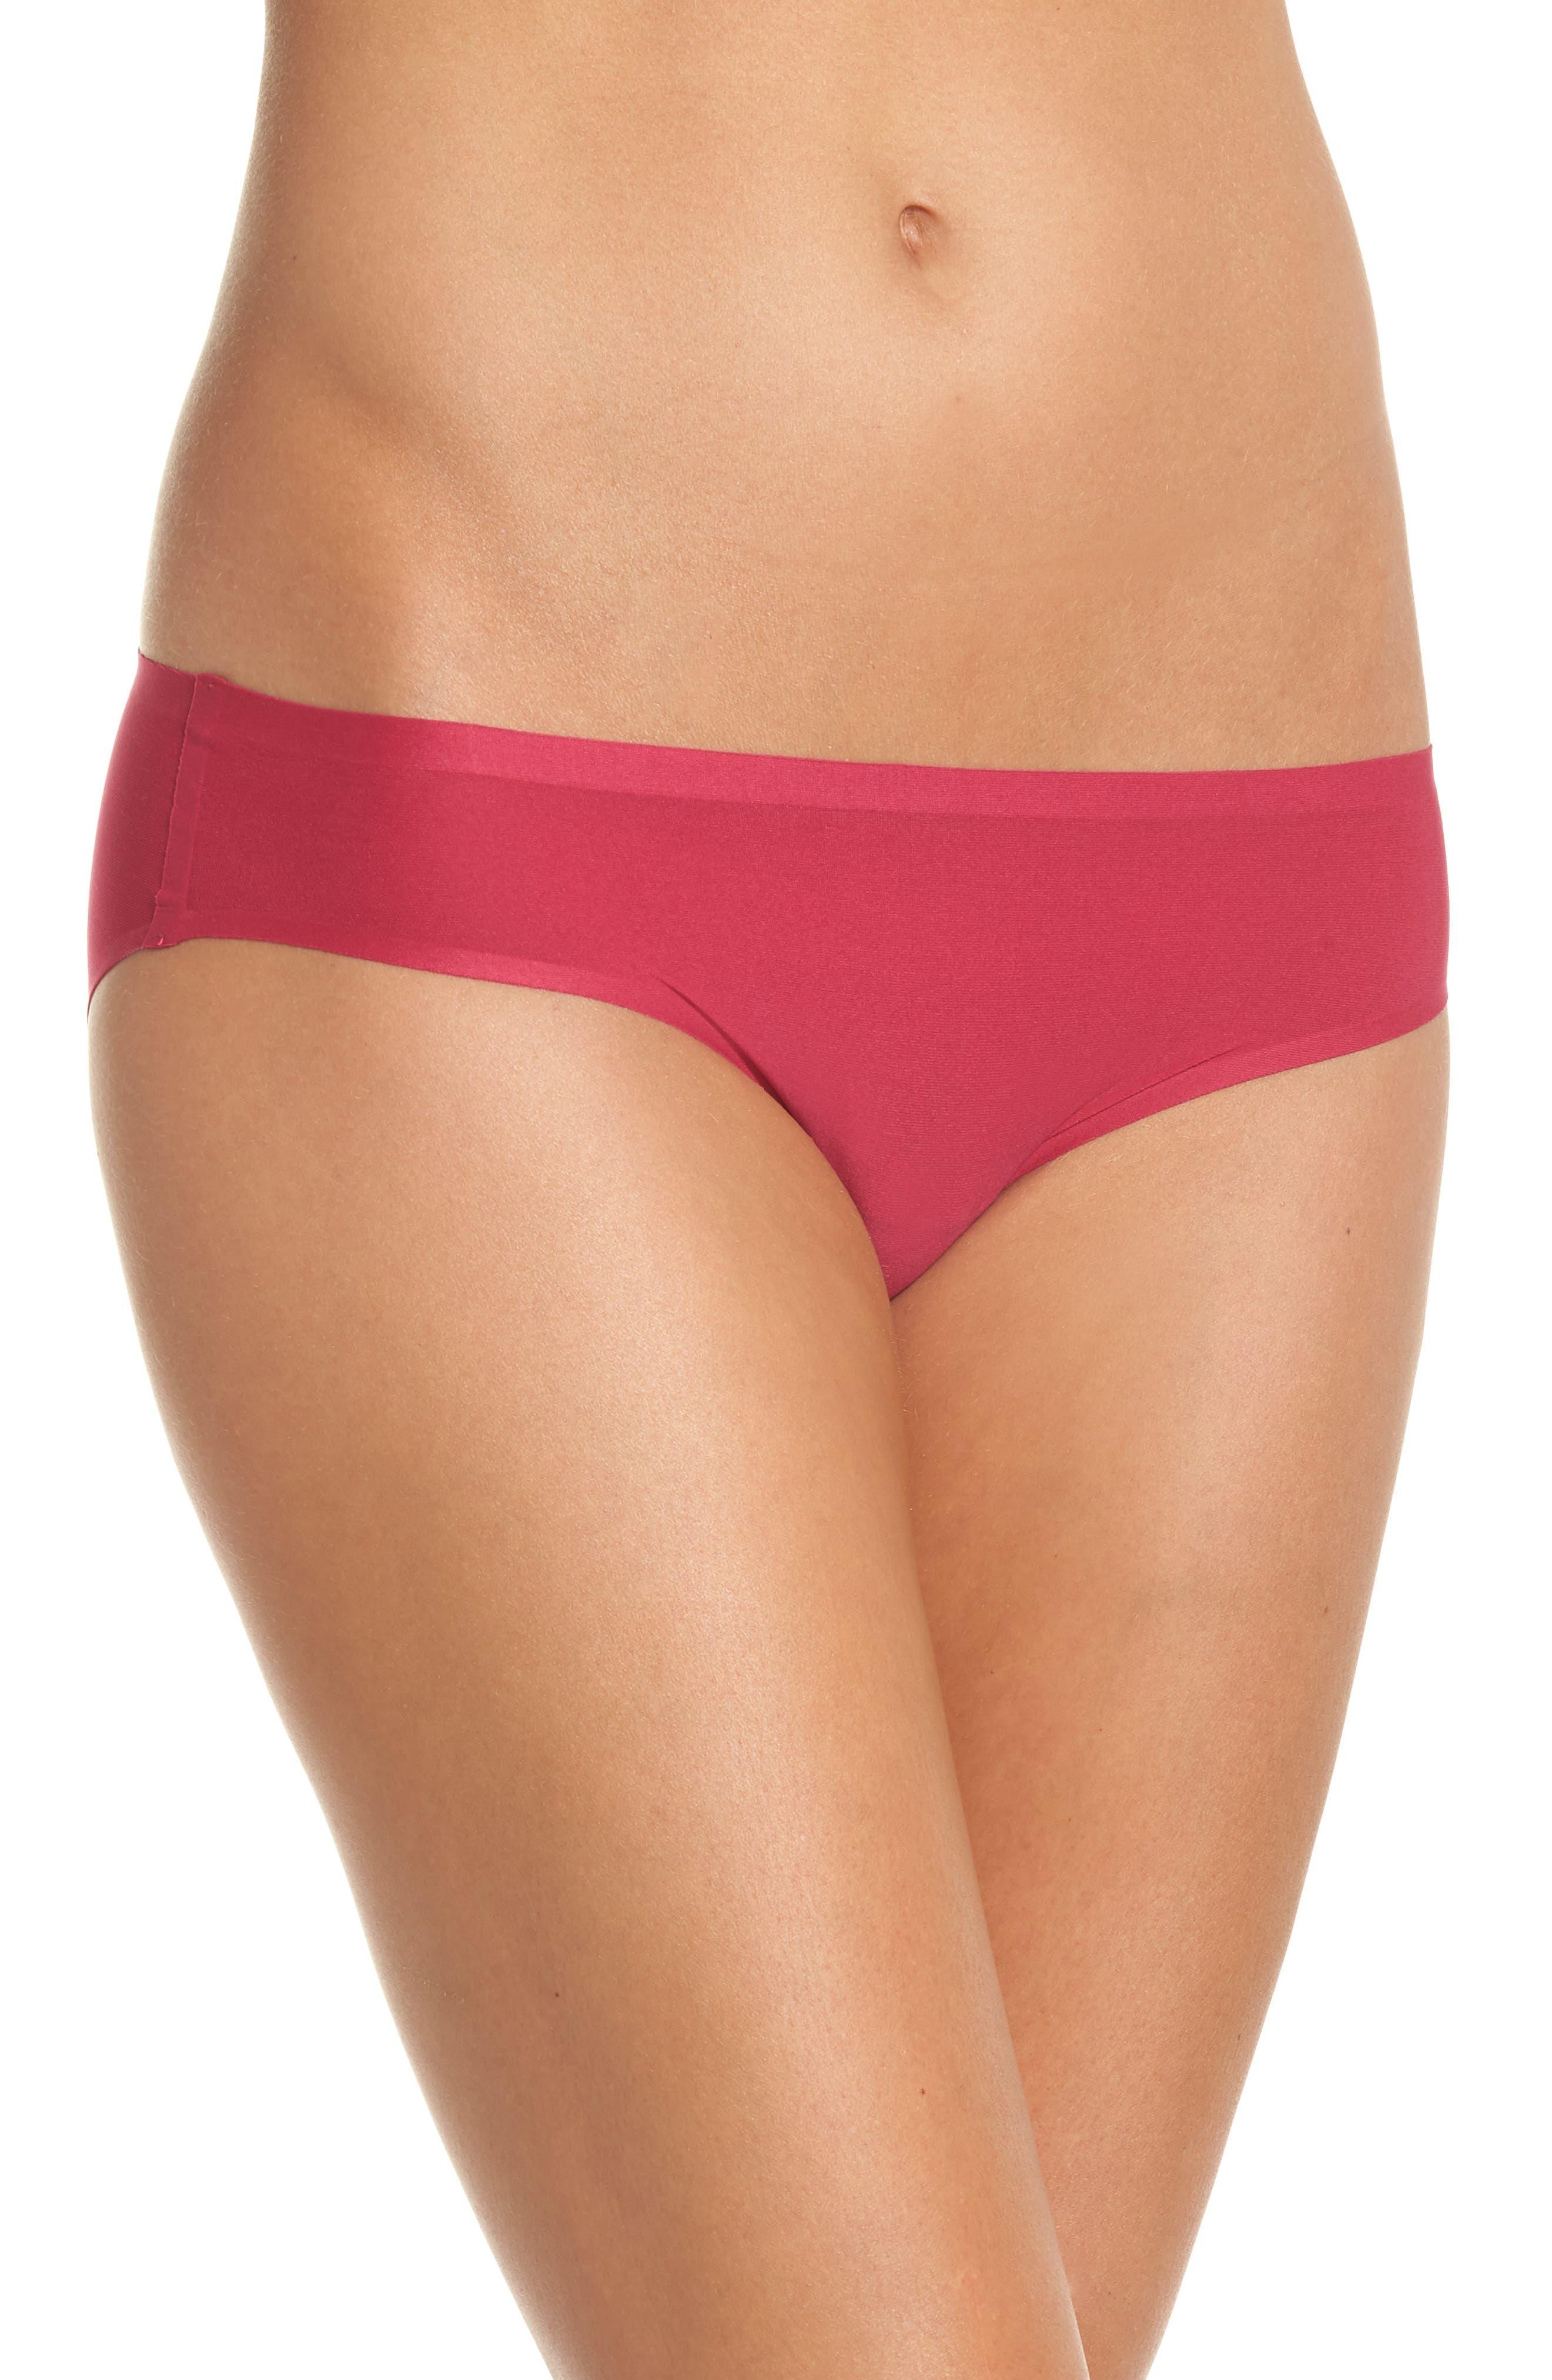 Soft Stretch Seamless Bikini,                             Main thumbnail 1, color,                             MAGENTA